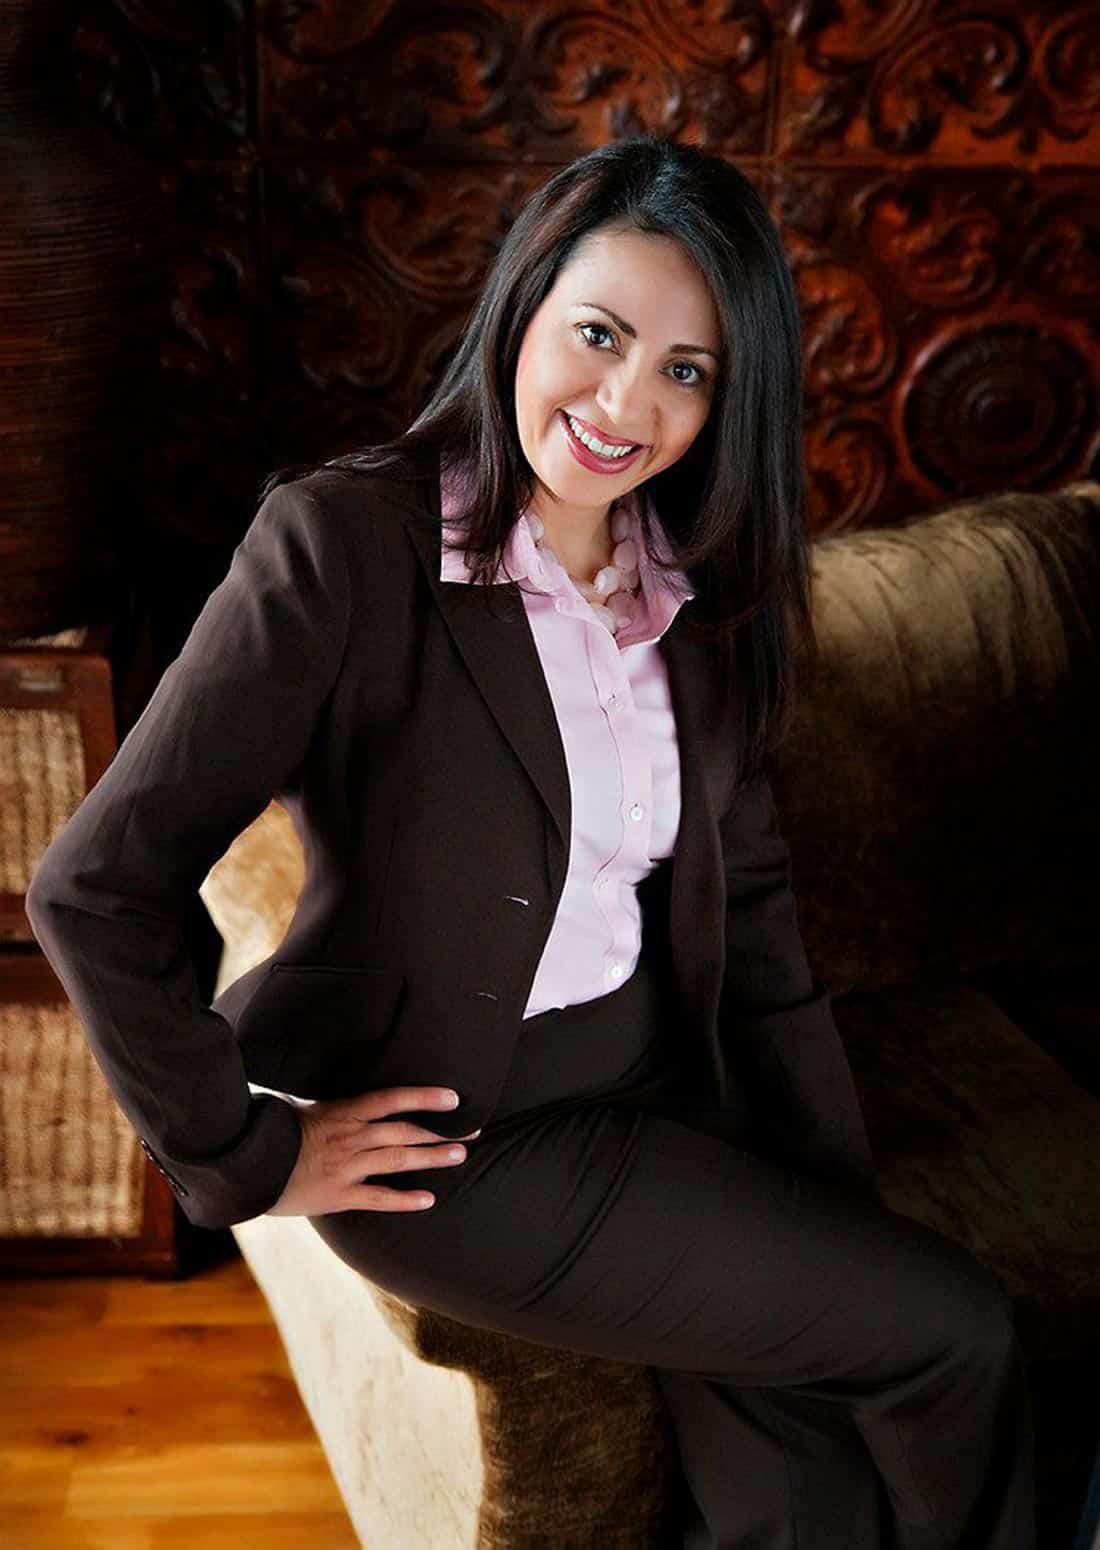 Female Business Headshot.